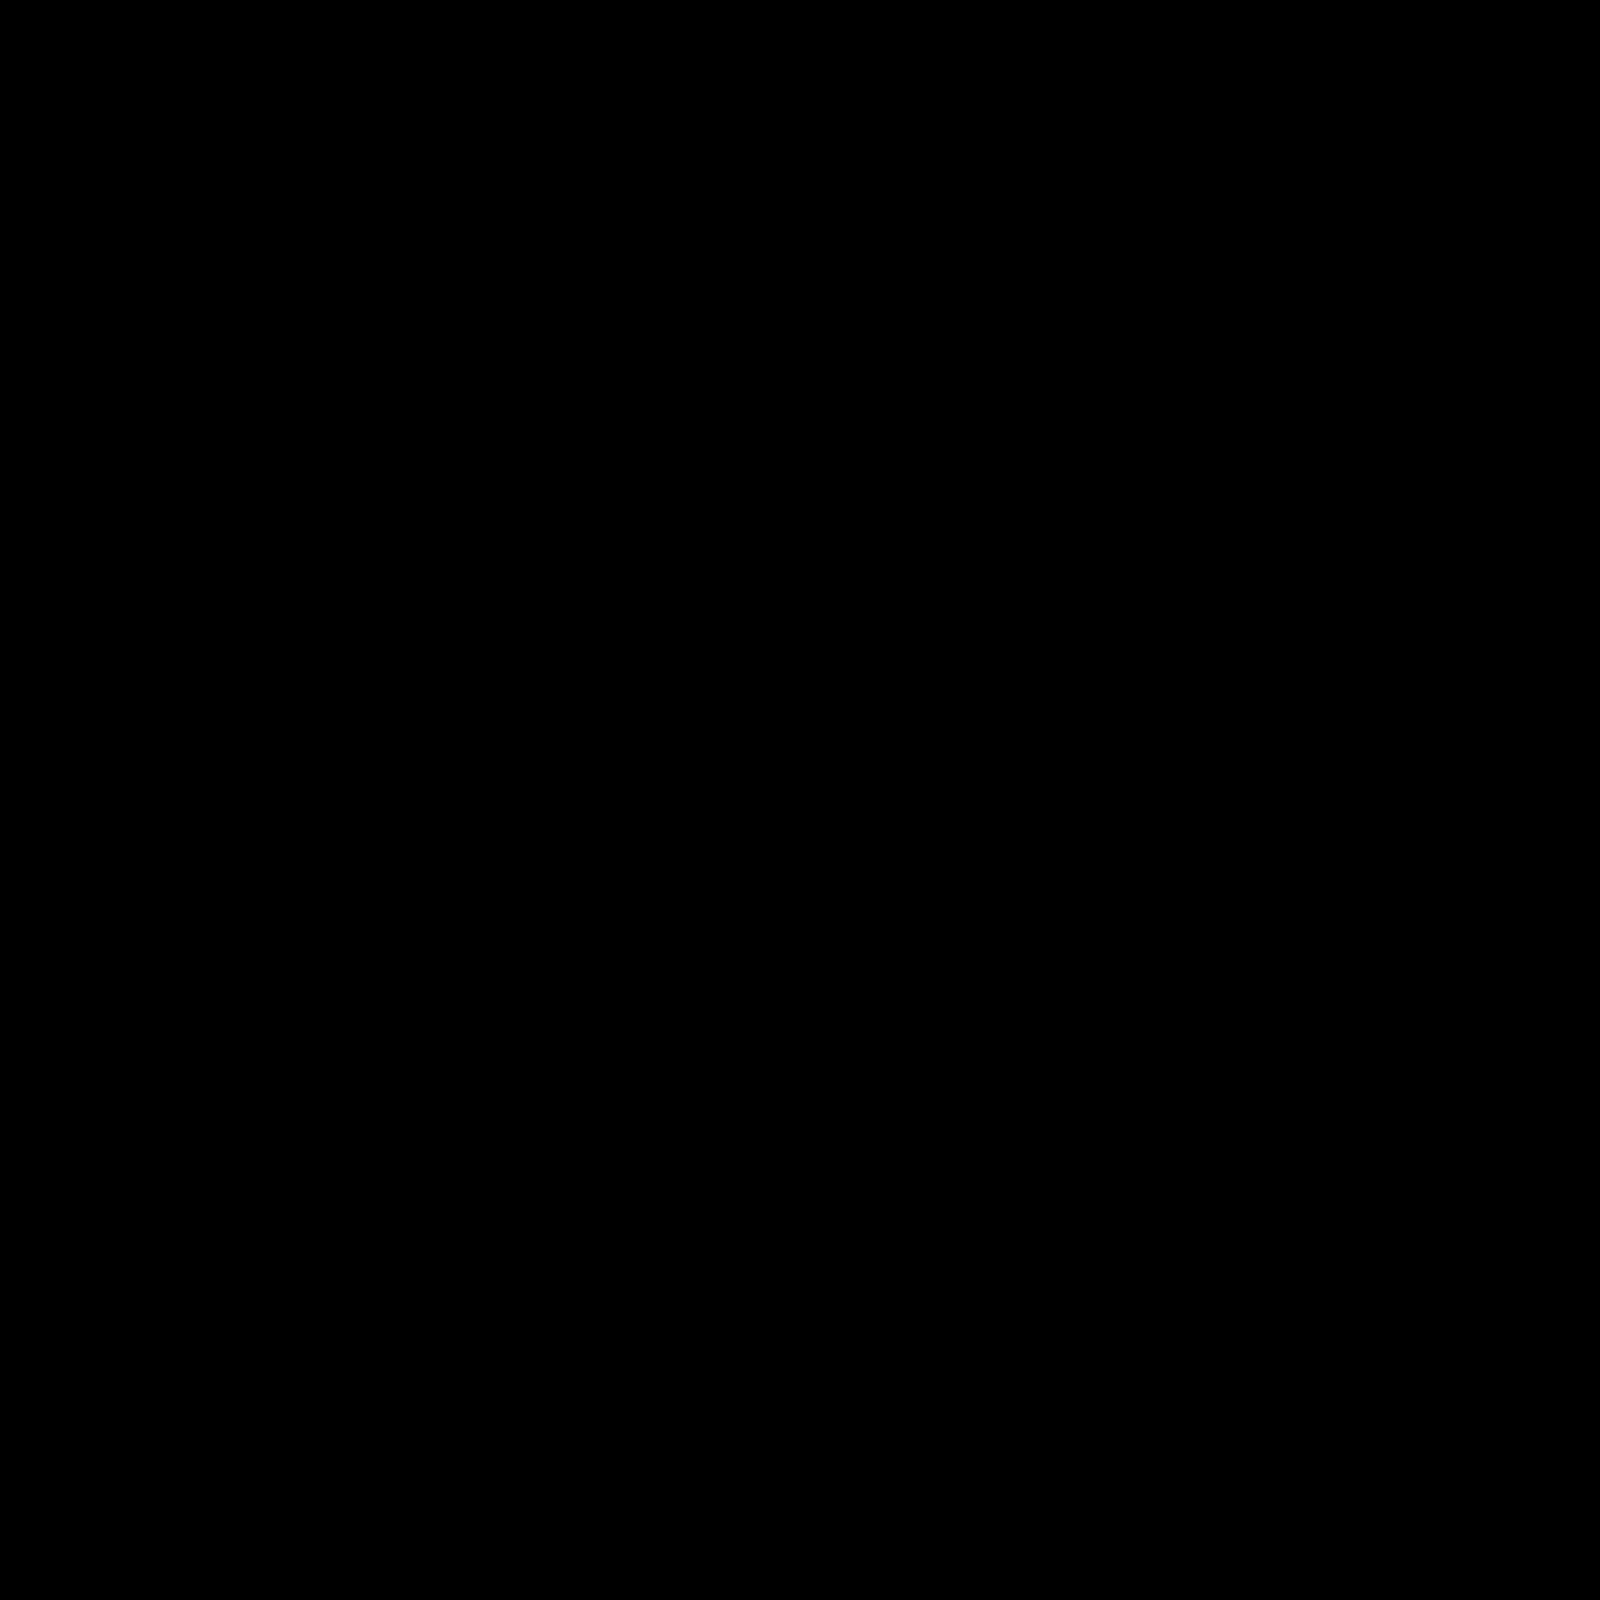 Resume Template icon